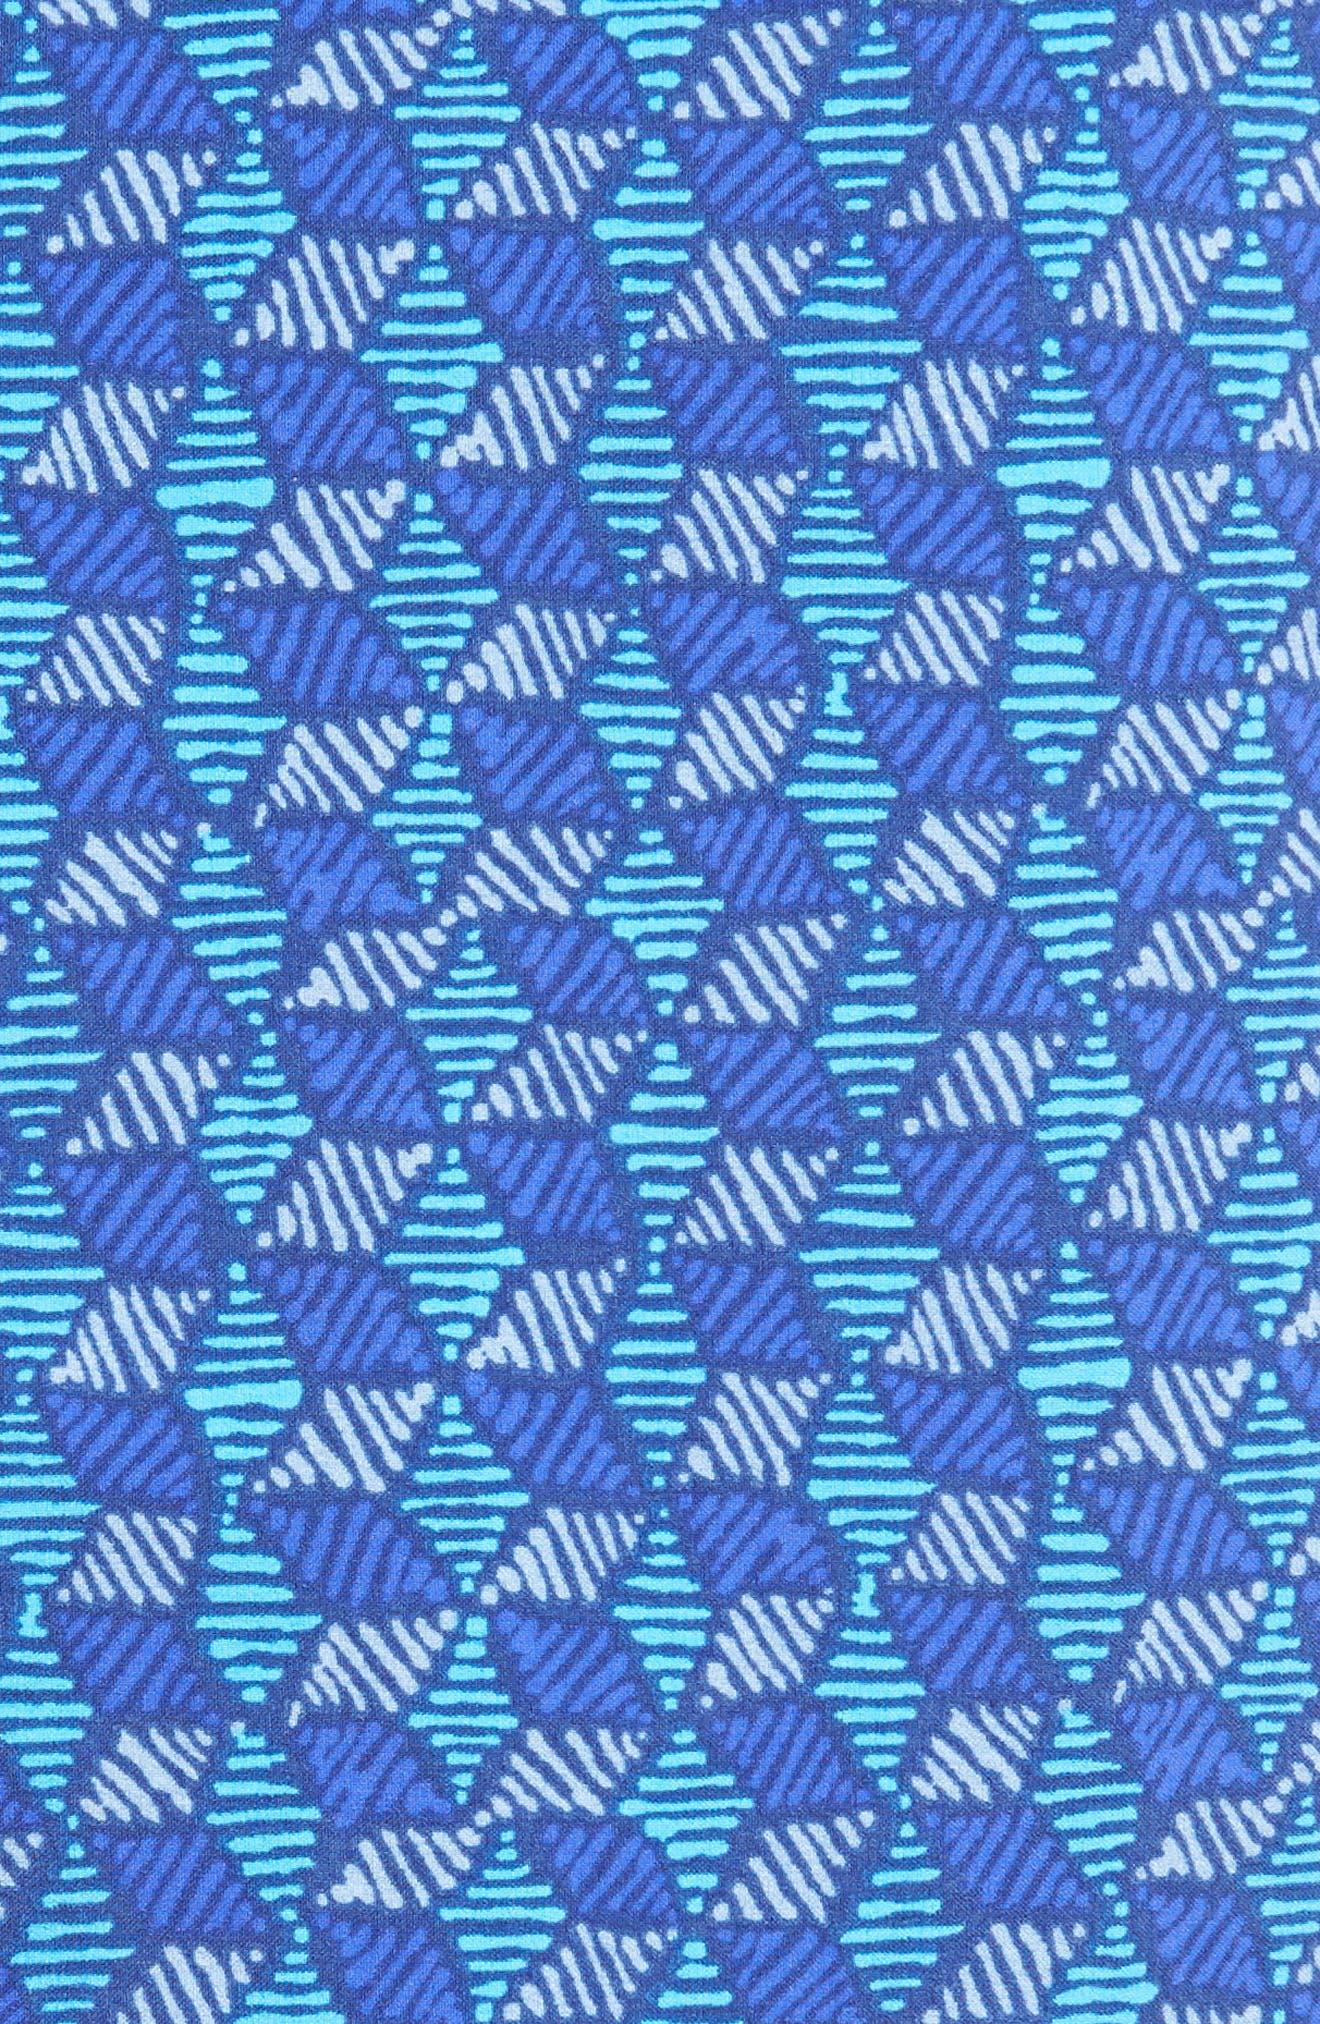 Wavefarer Swim Trunks,                             Alternate thumbnail 5, color,                             BATIK HEX MULTI/ RADAR BLUE